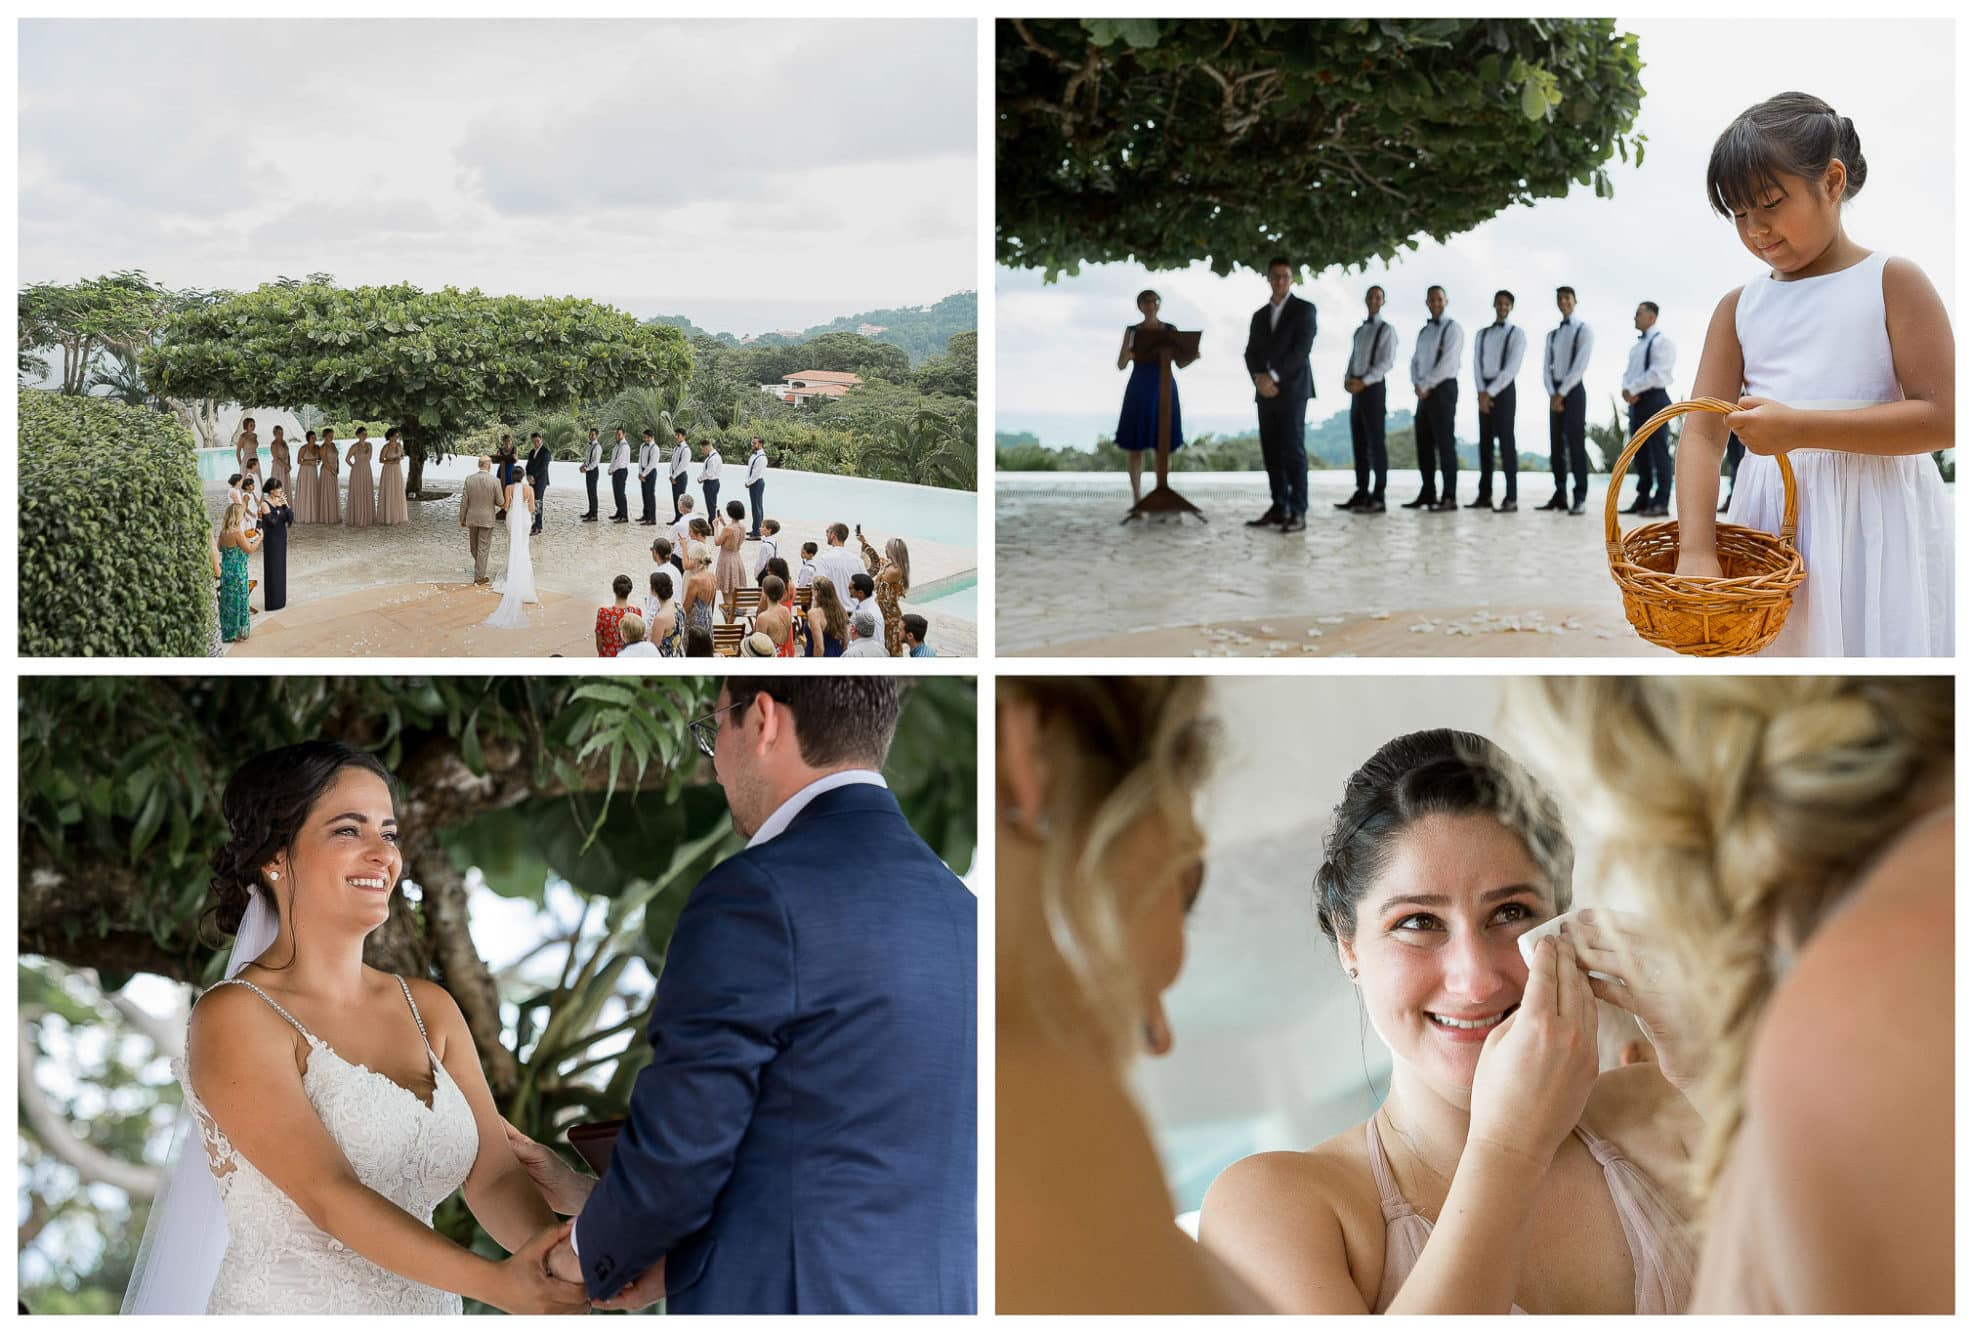 Mariposa Hotel Wedding Ceremony